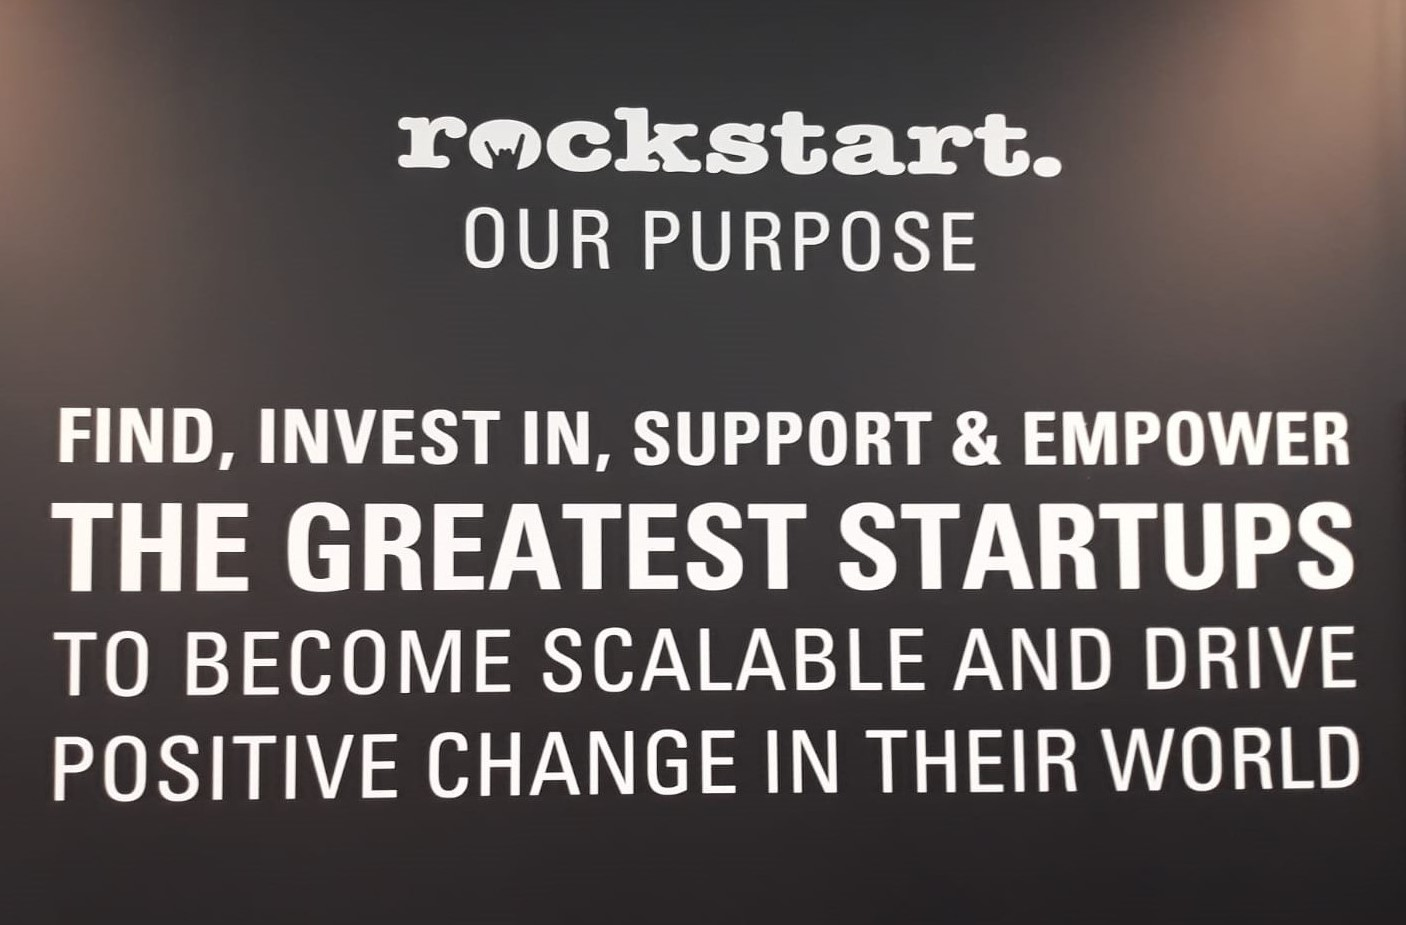 amsterdam-startup-purpose-rockstart